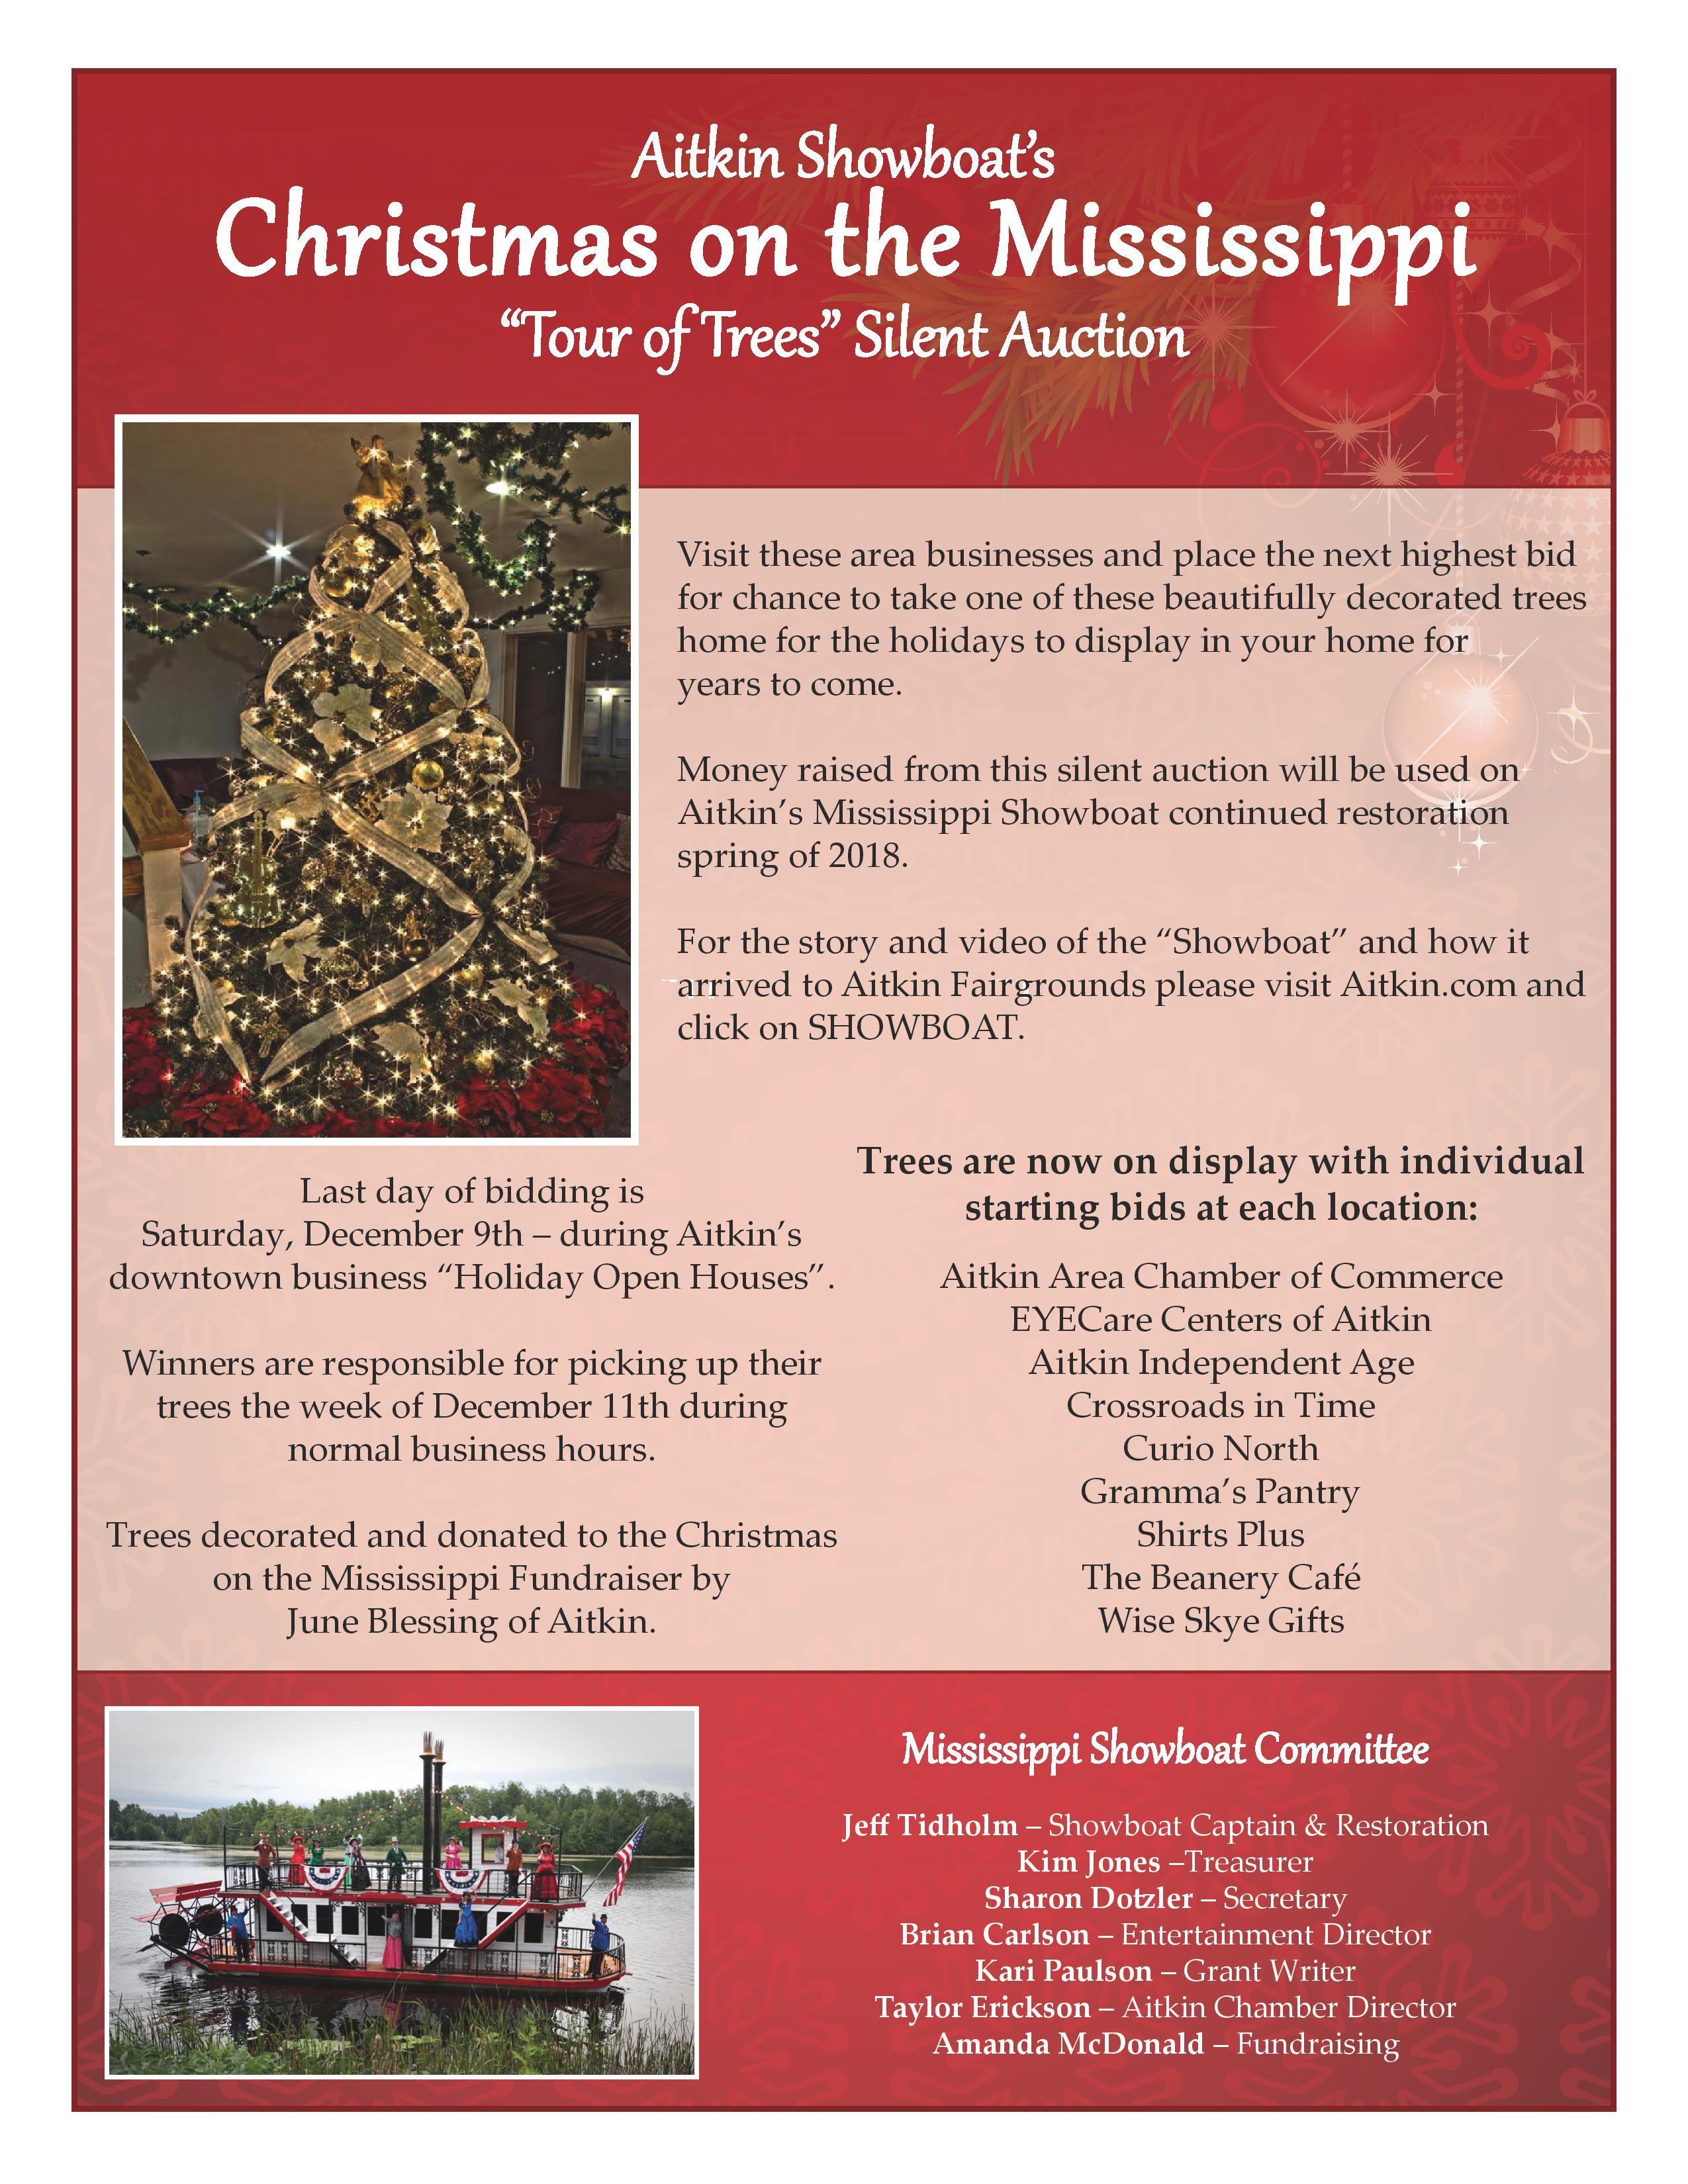 Christmas on the Mississippi Tour of Trees November